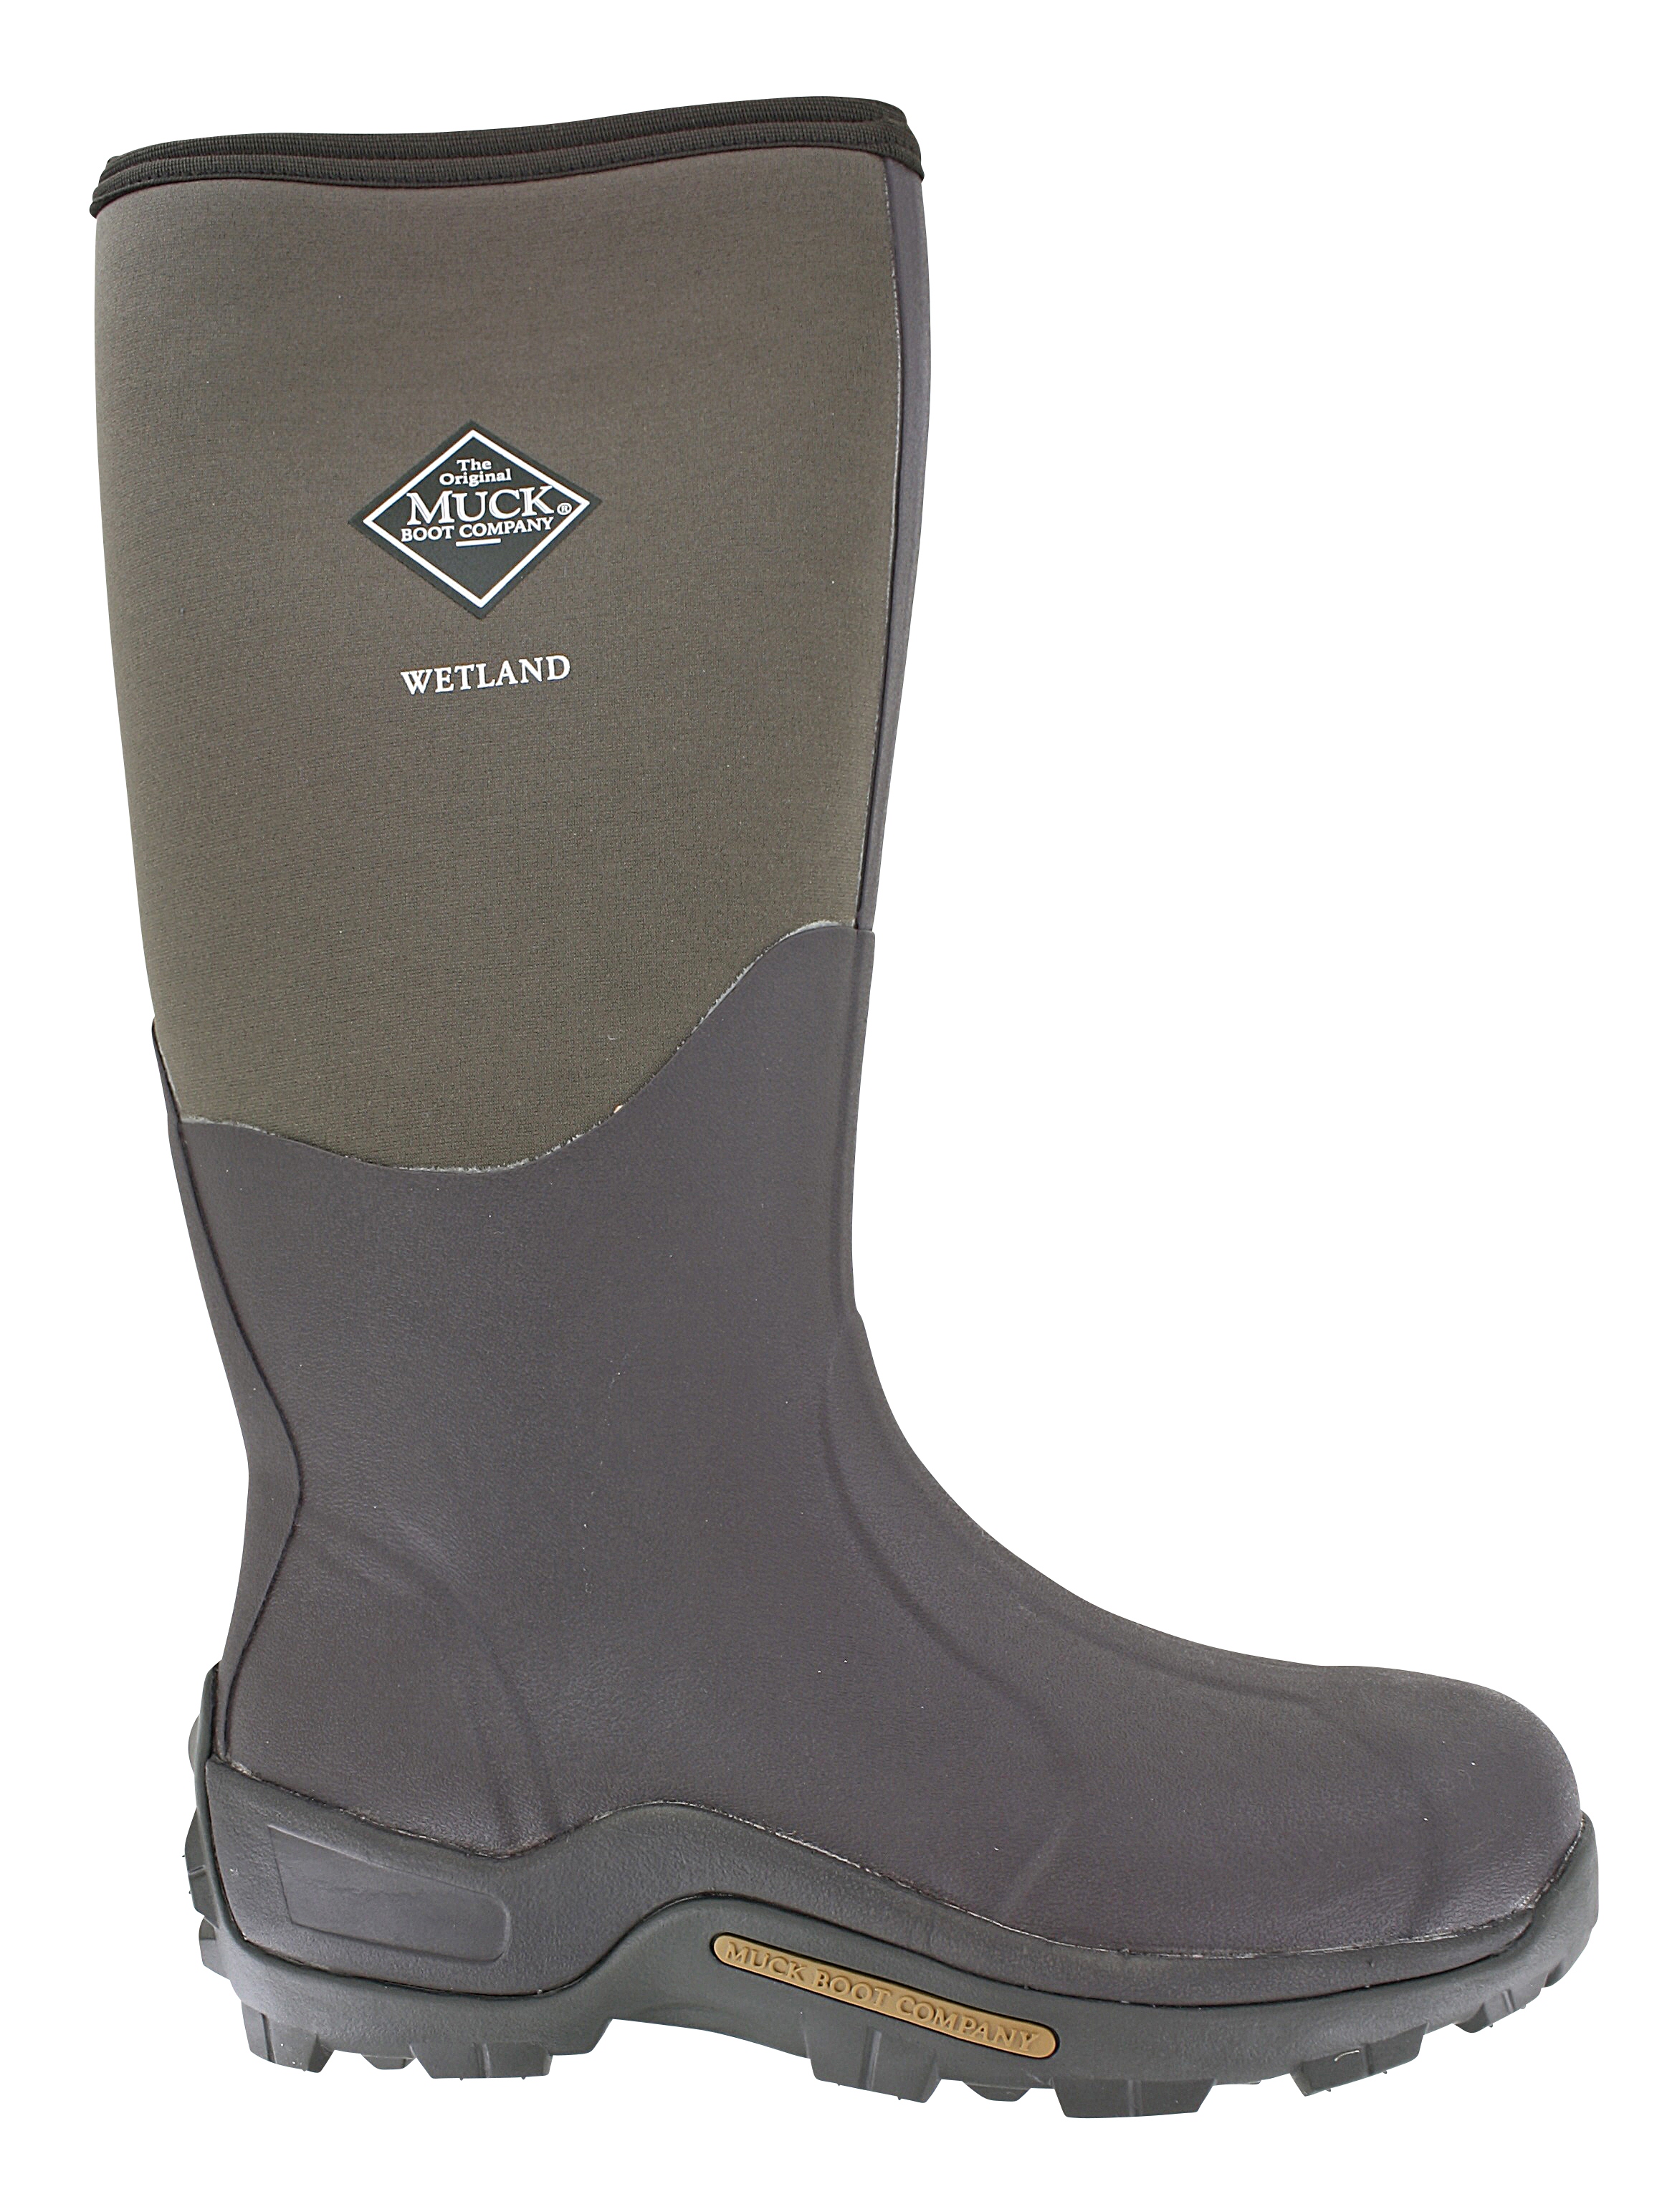 Mens Muck Wetland Waterproof Boot Bark